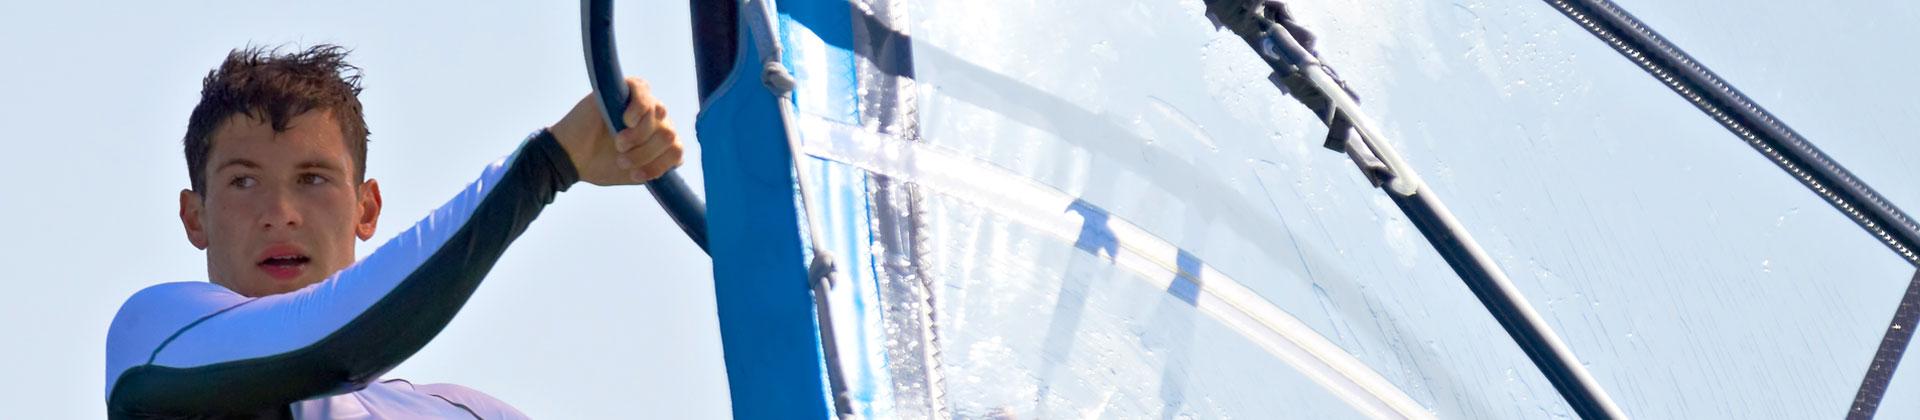 https://www.goodmorningtenerife.com/wp-content/uploads/2014/08/01_slide_windsurfing_GM_Tenerife.jpg